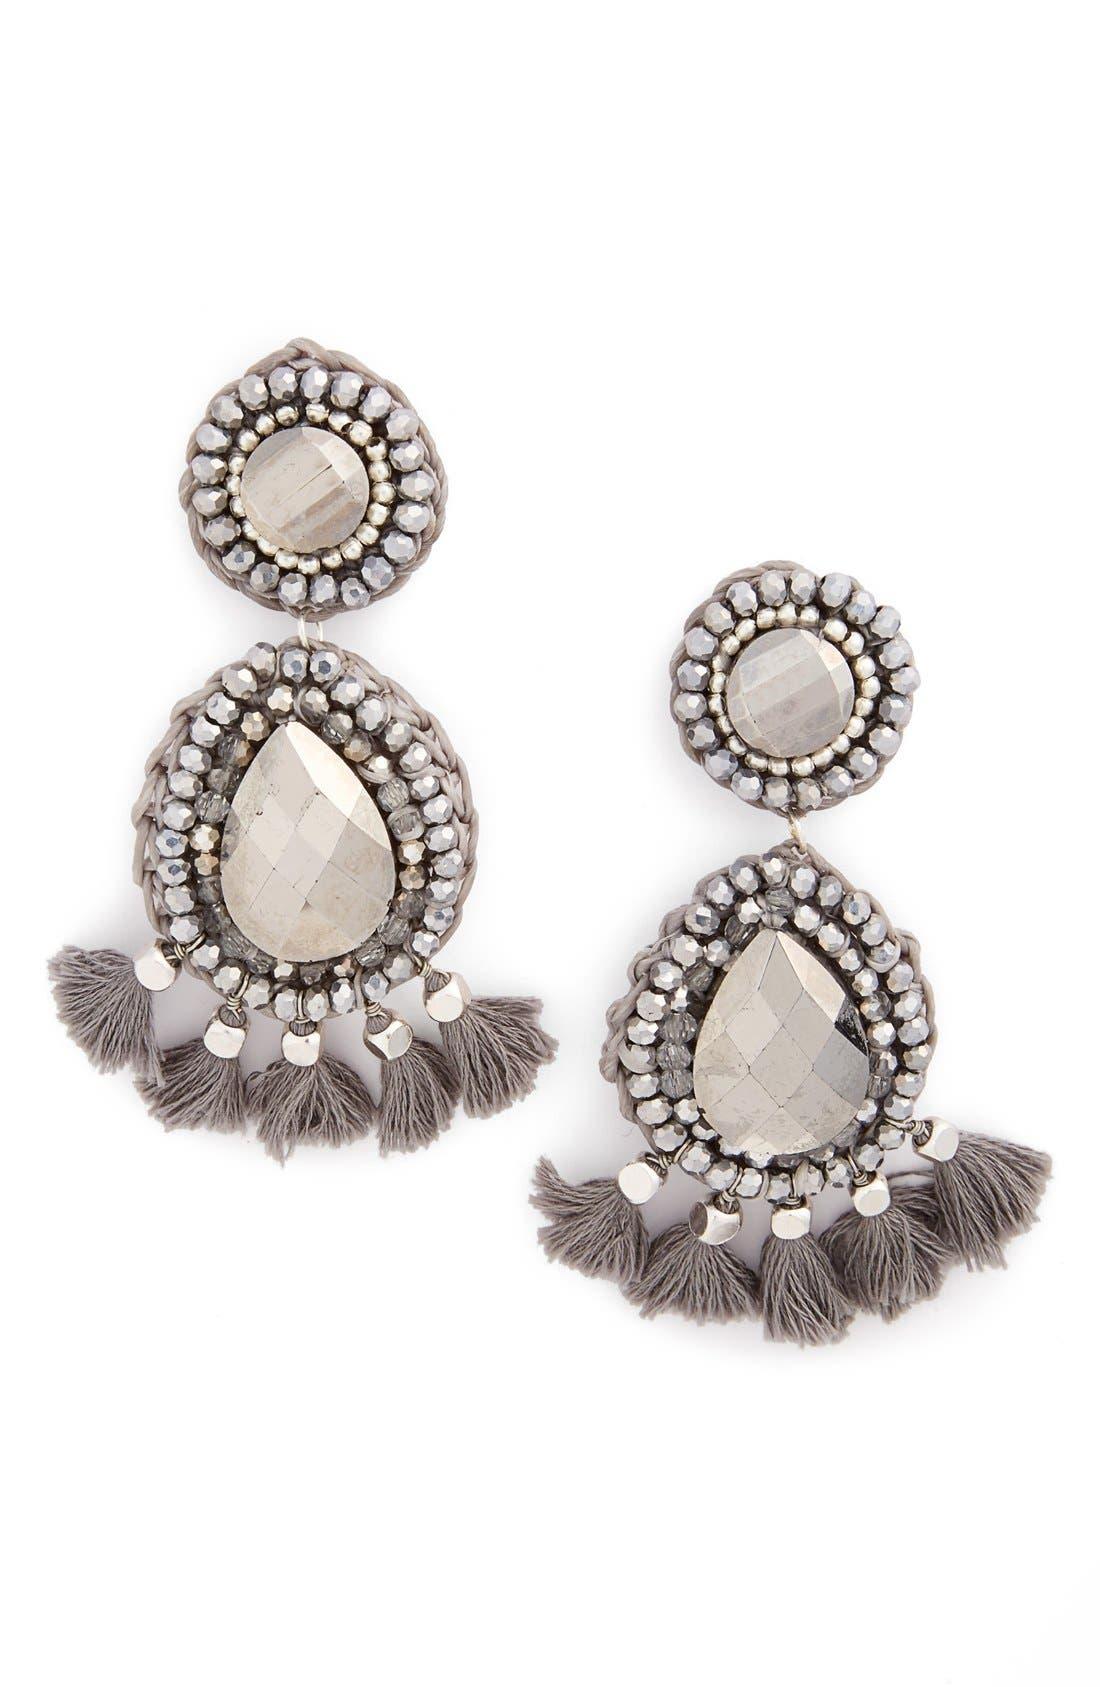 Rope Tassel Statement Earrings,                         Main,                         color, Silver